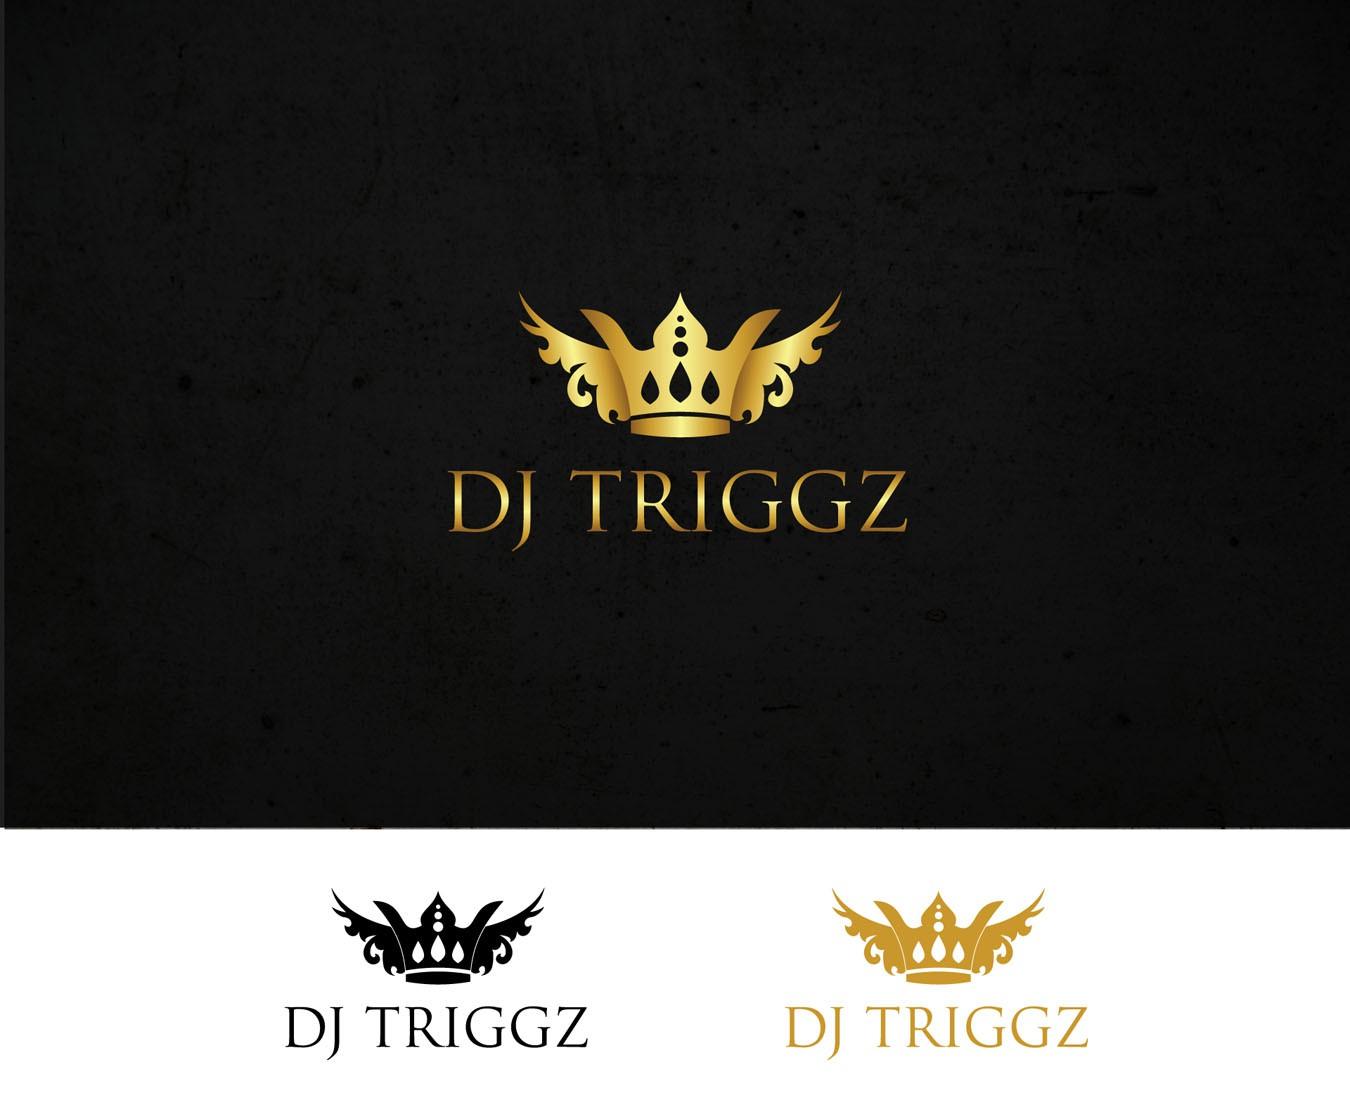 New logo wanted for DJ Triggz